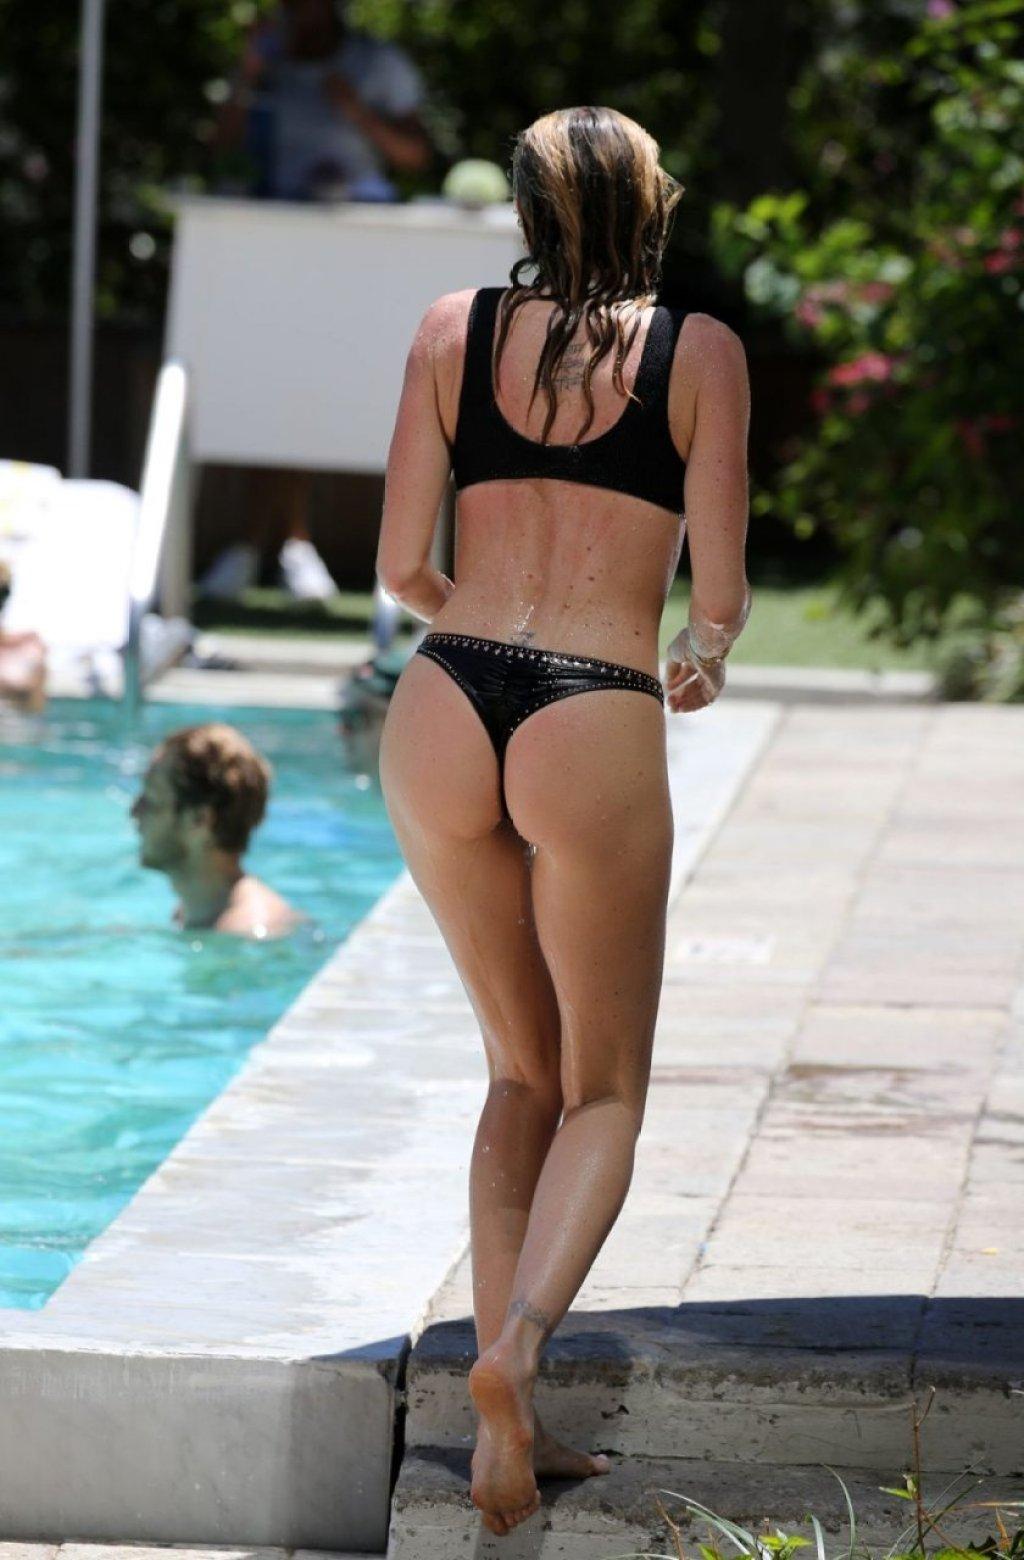 Paola Ambrosini Sexy (24 Photos)